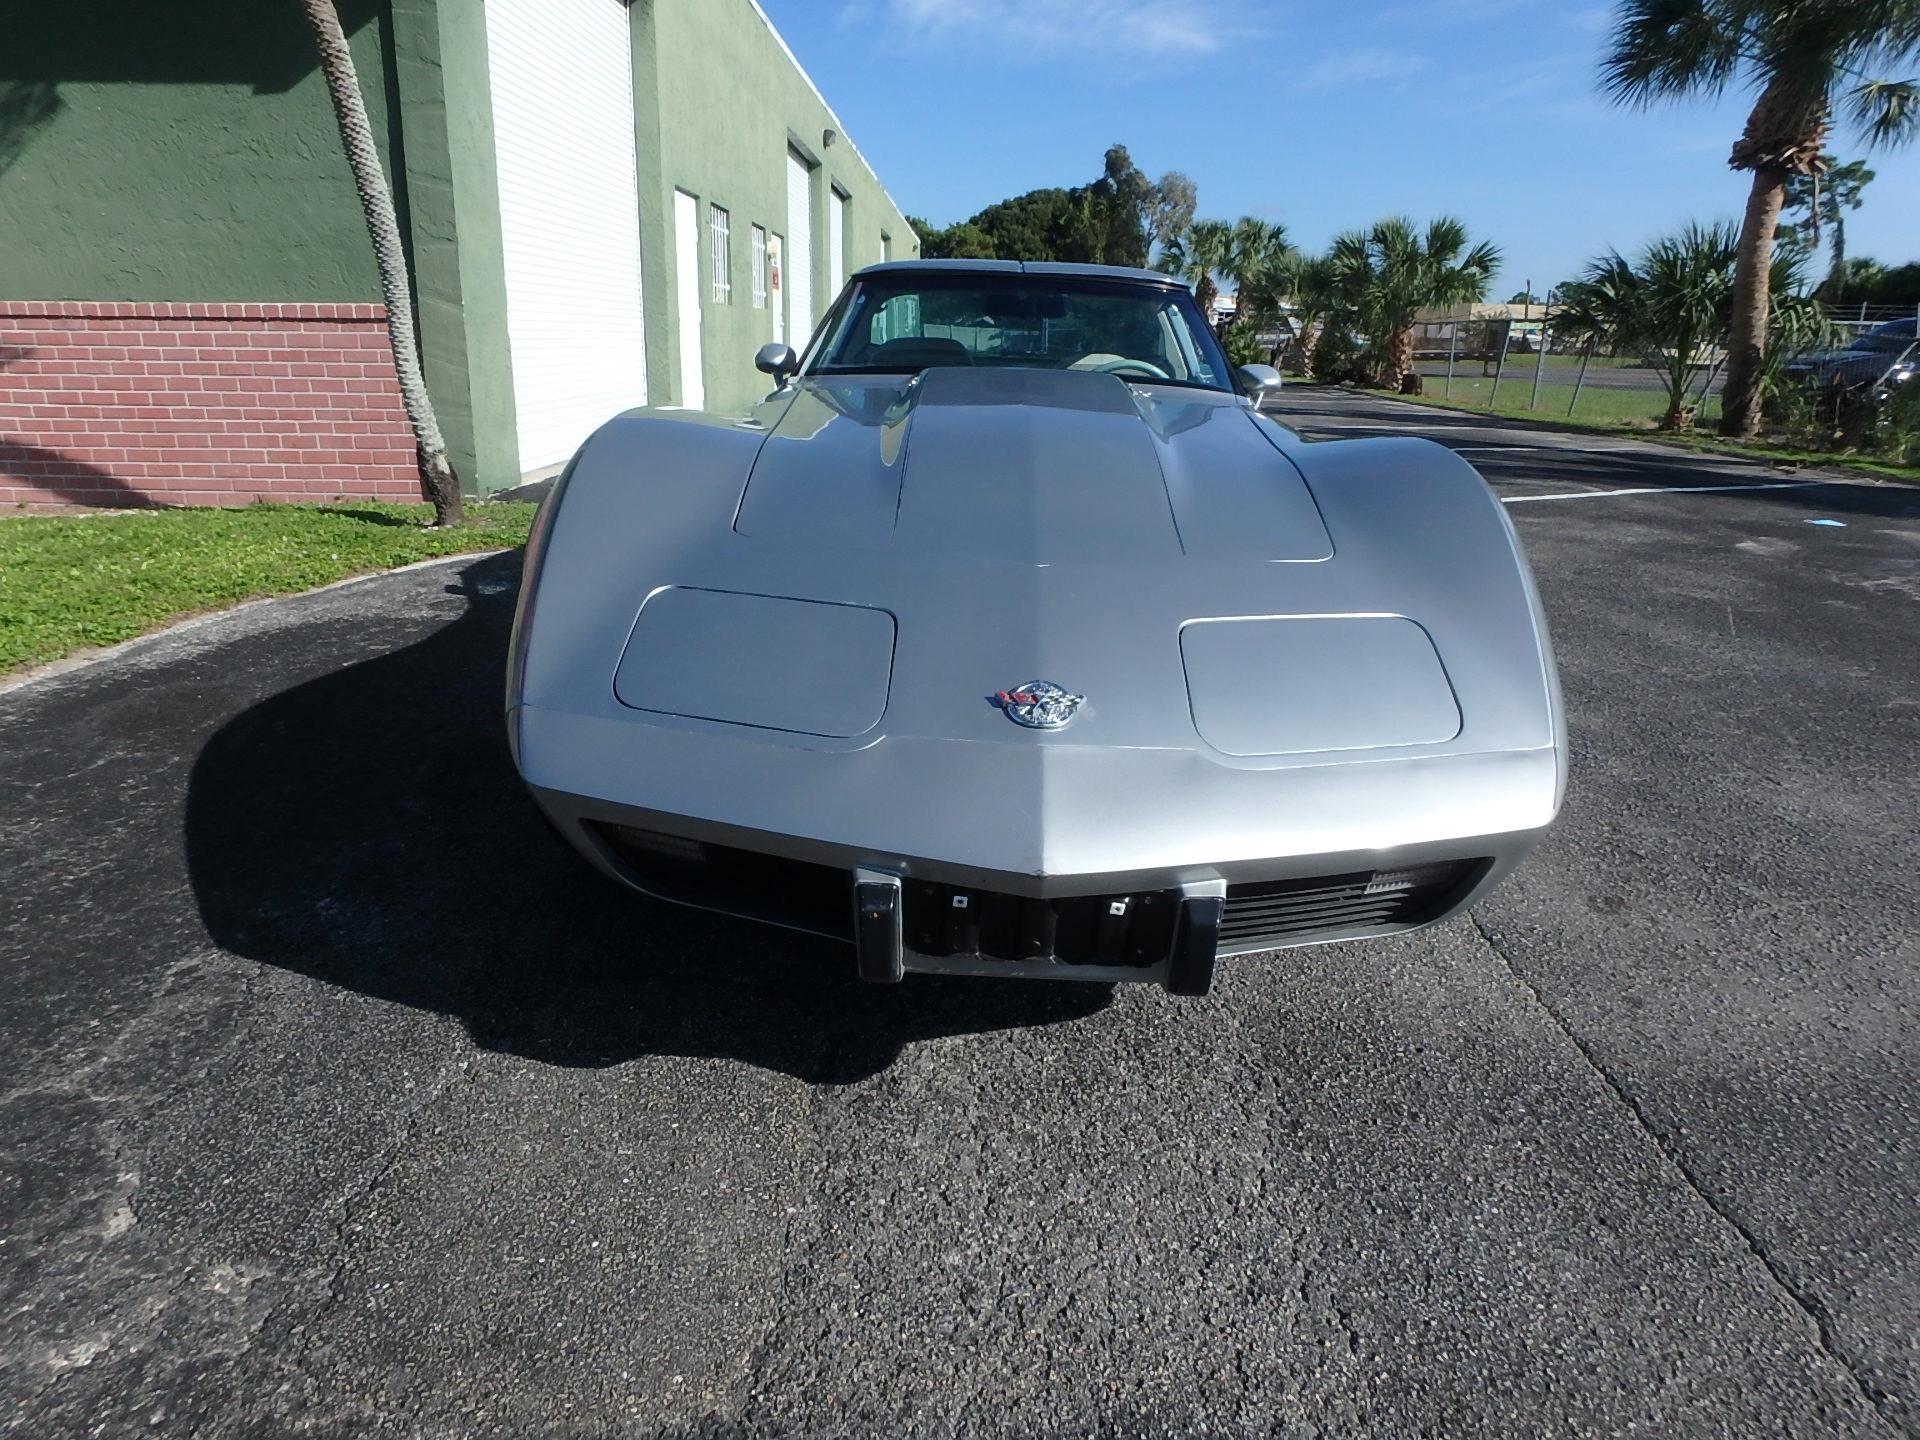 Used 1978 Chevy Corvette L82 25th Anniversary Edition